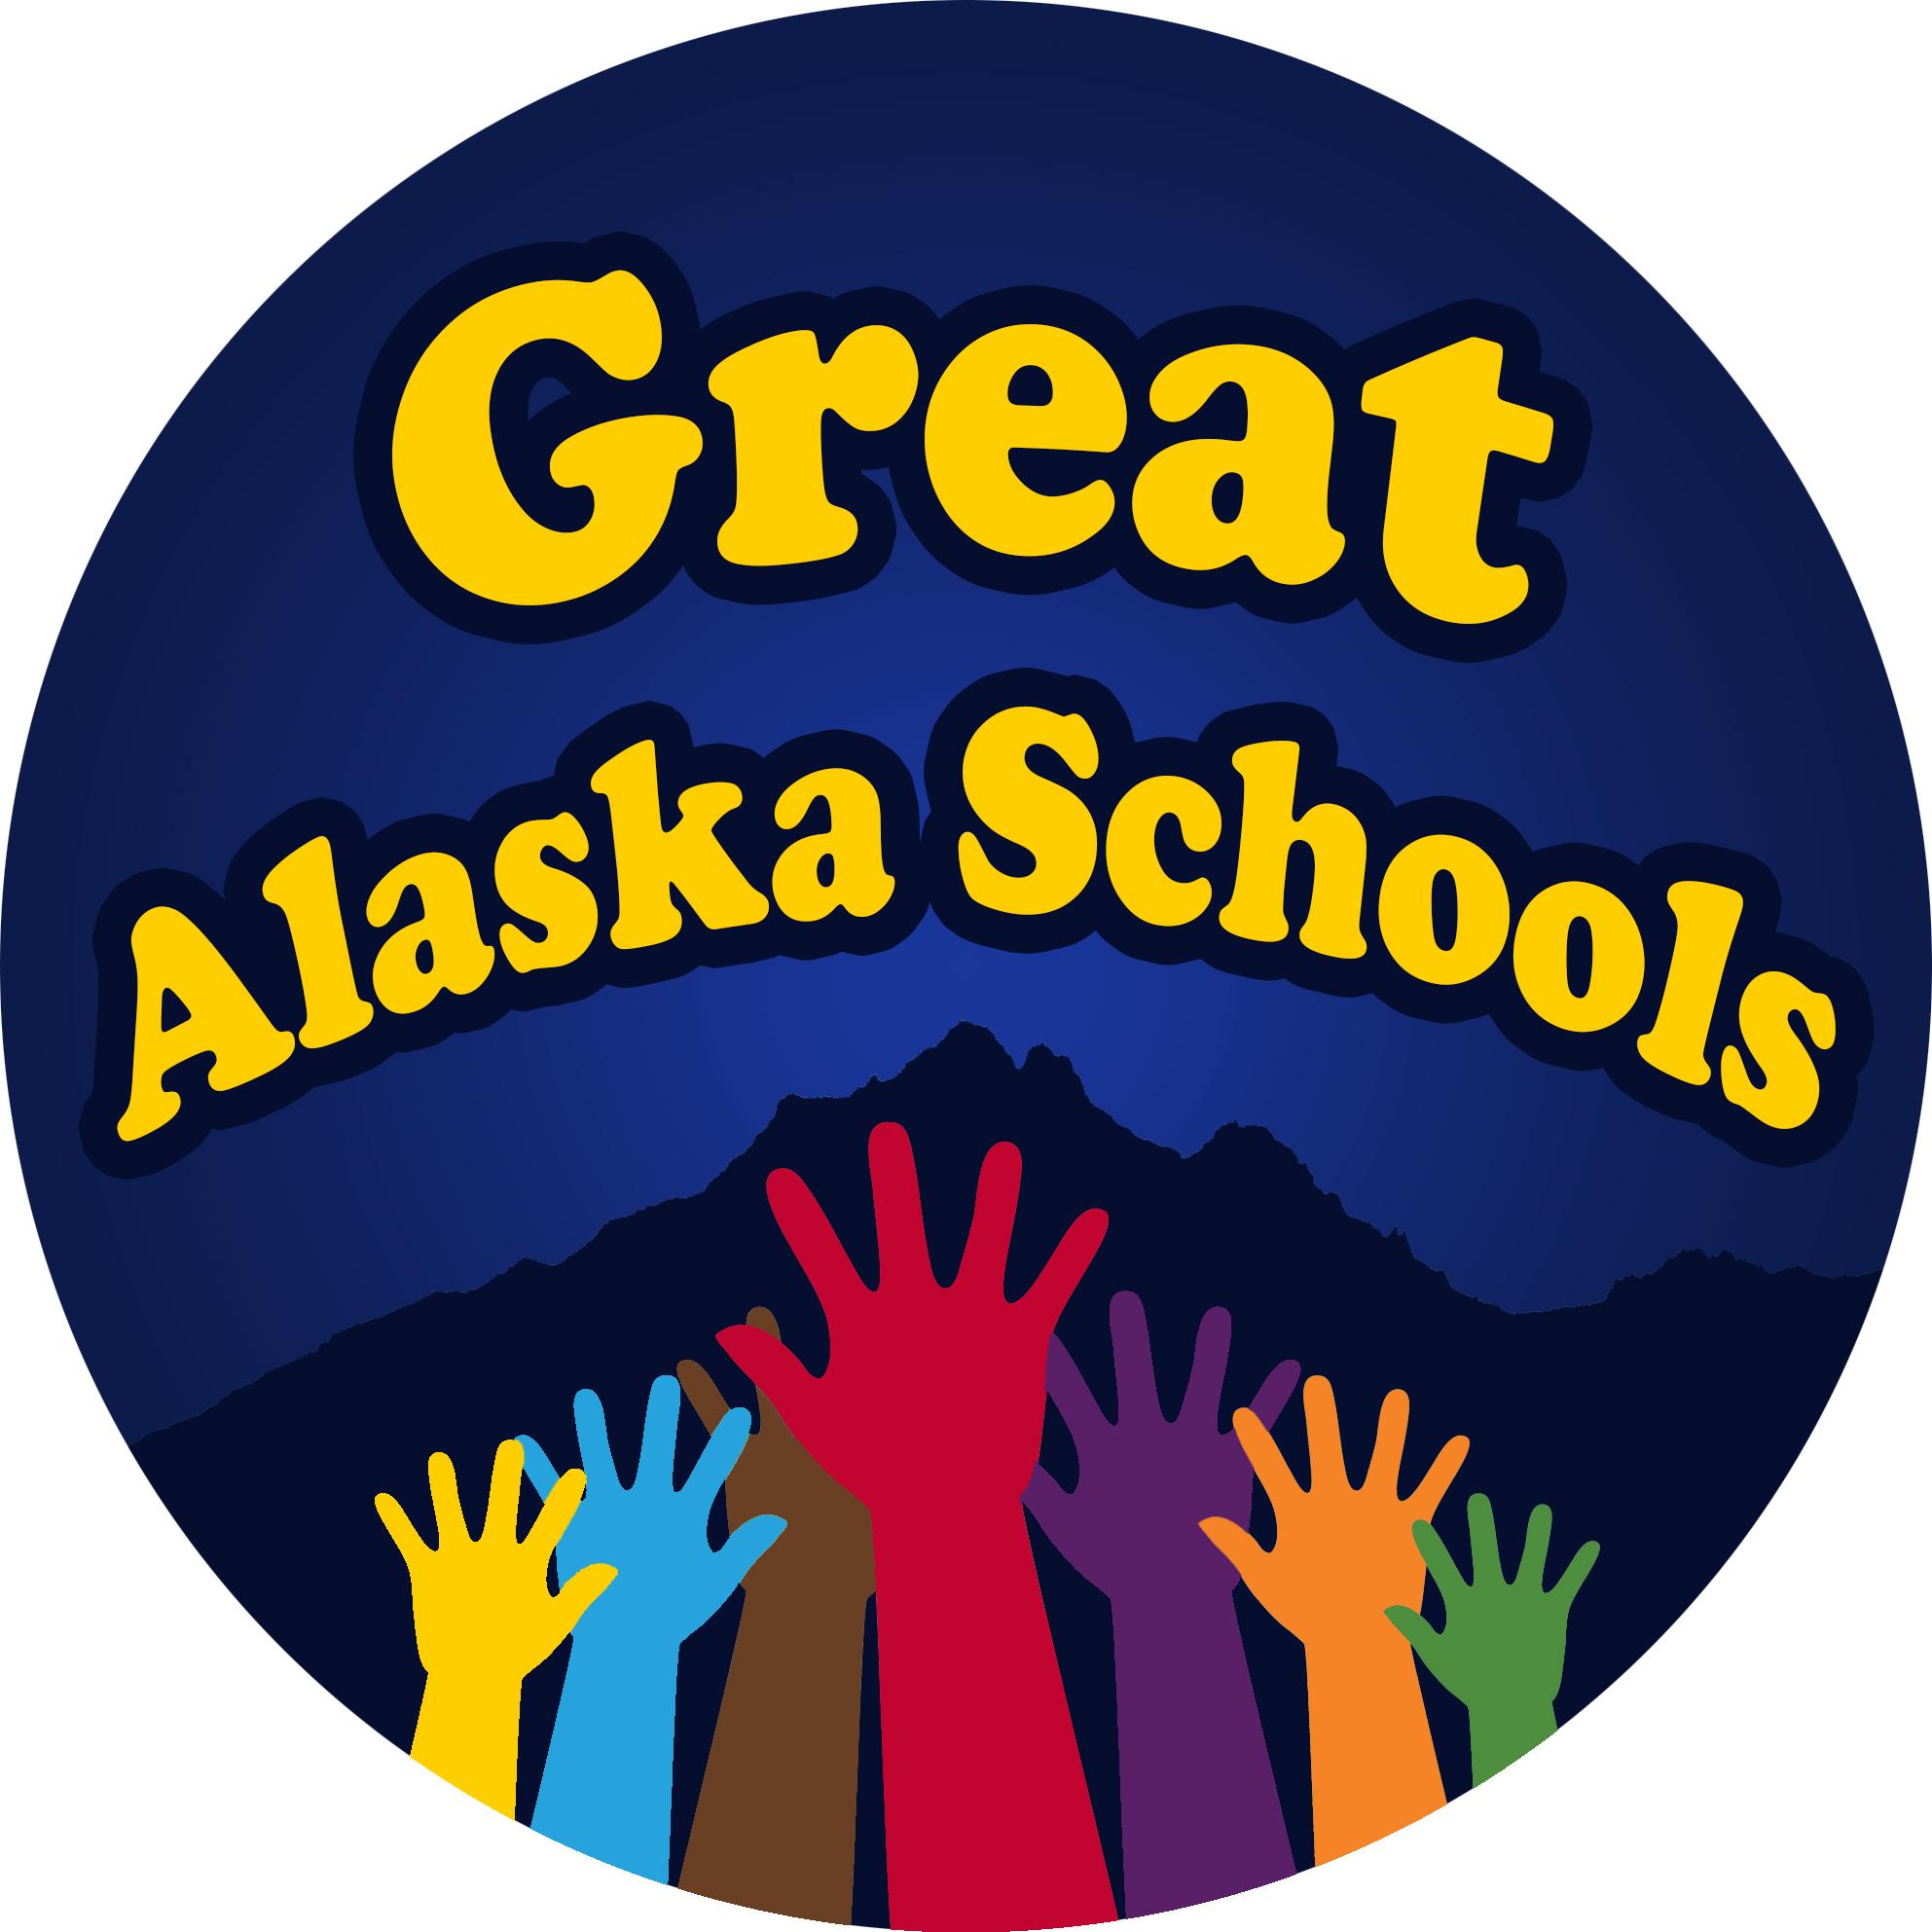 Great_alaska_schools_logo